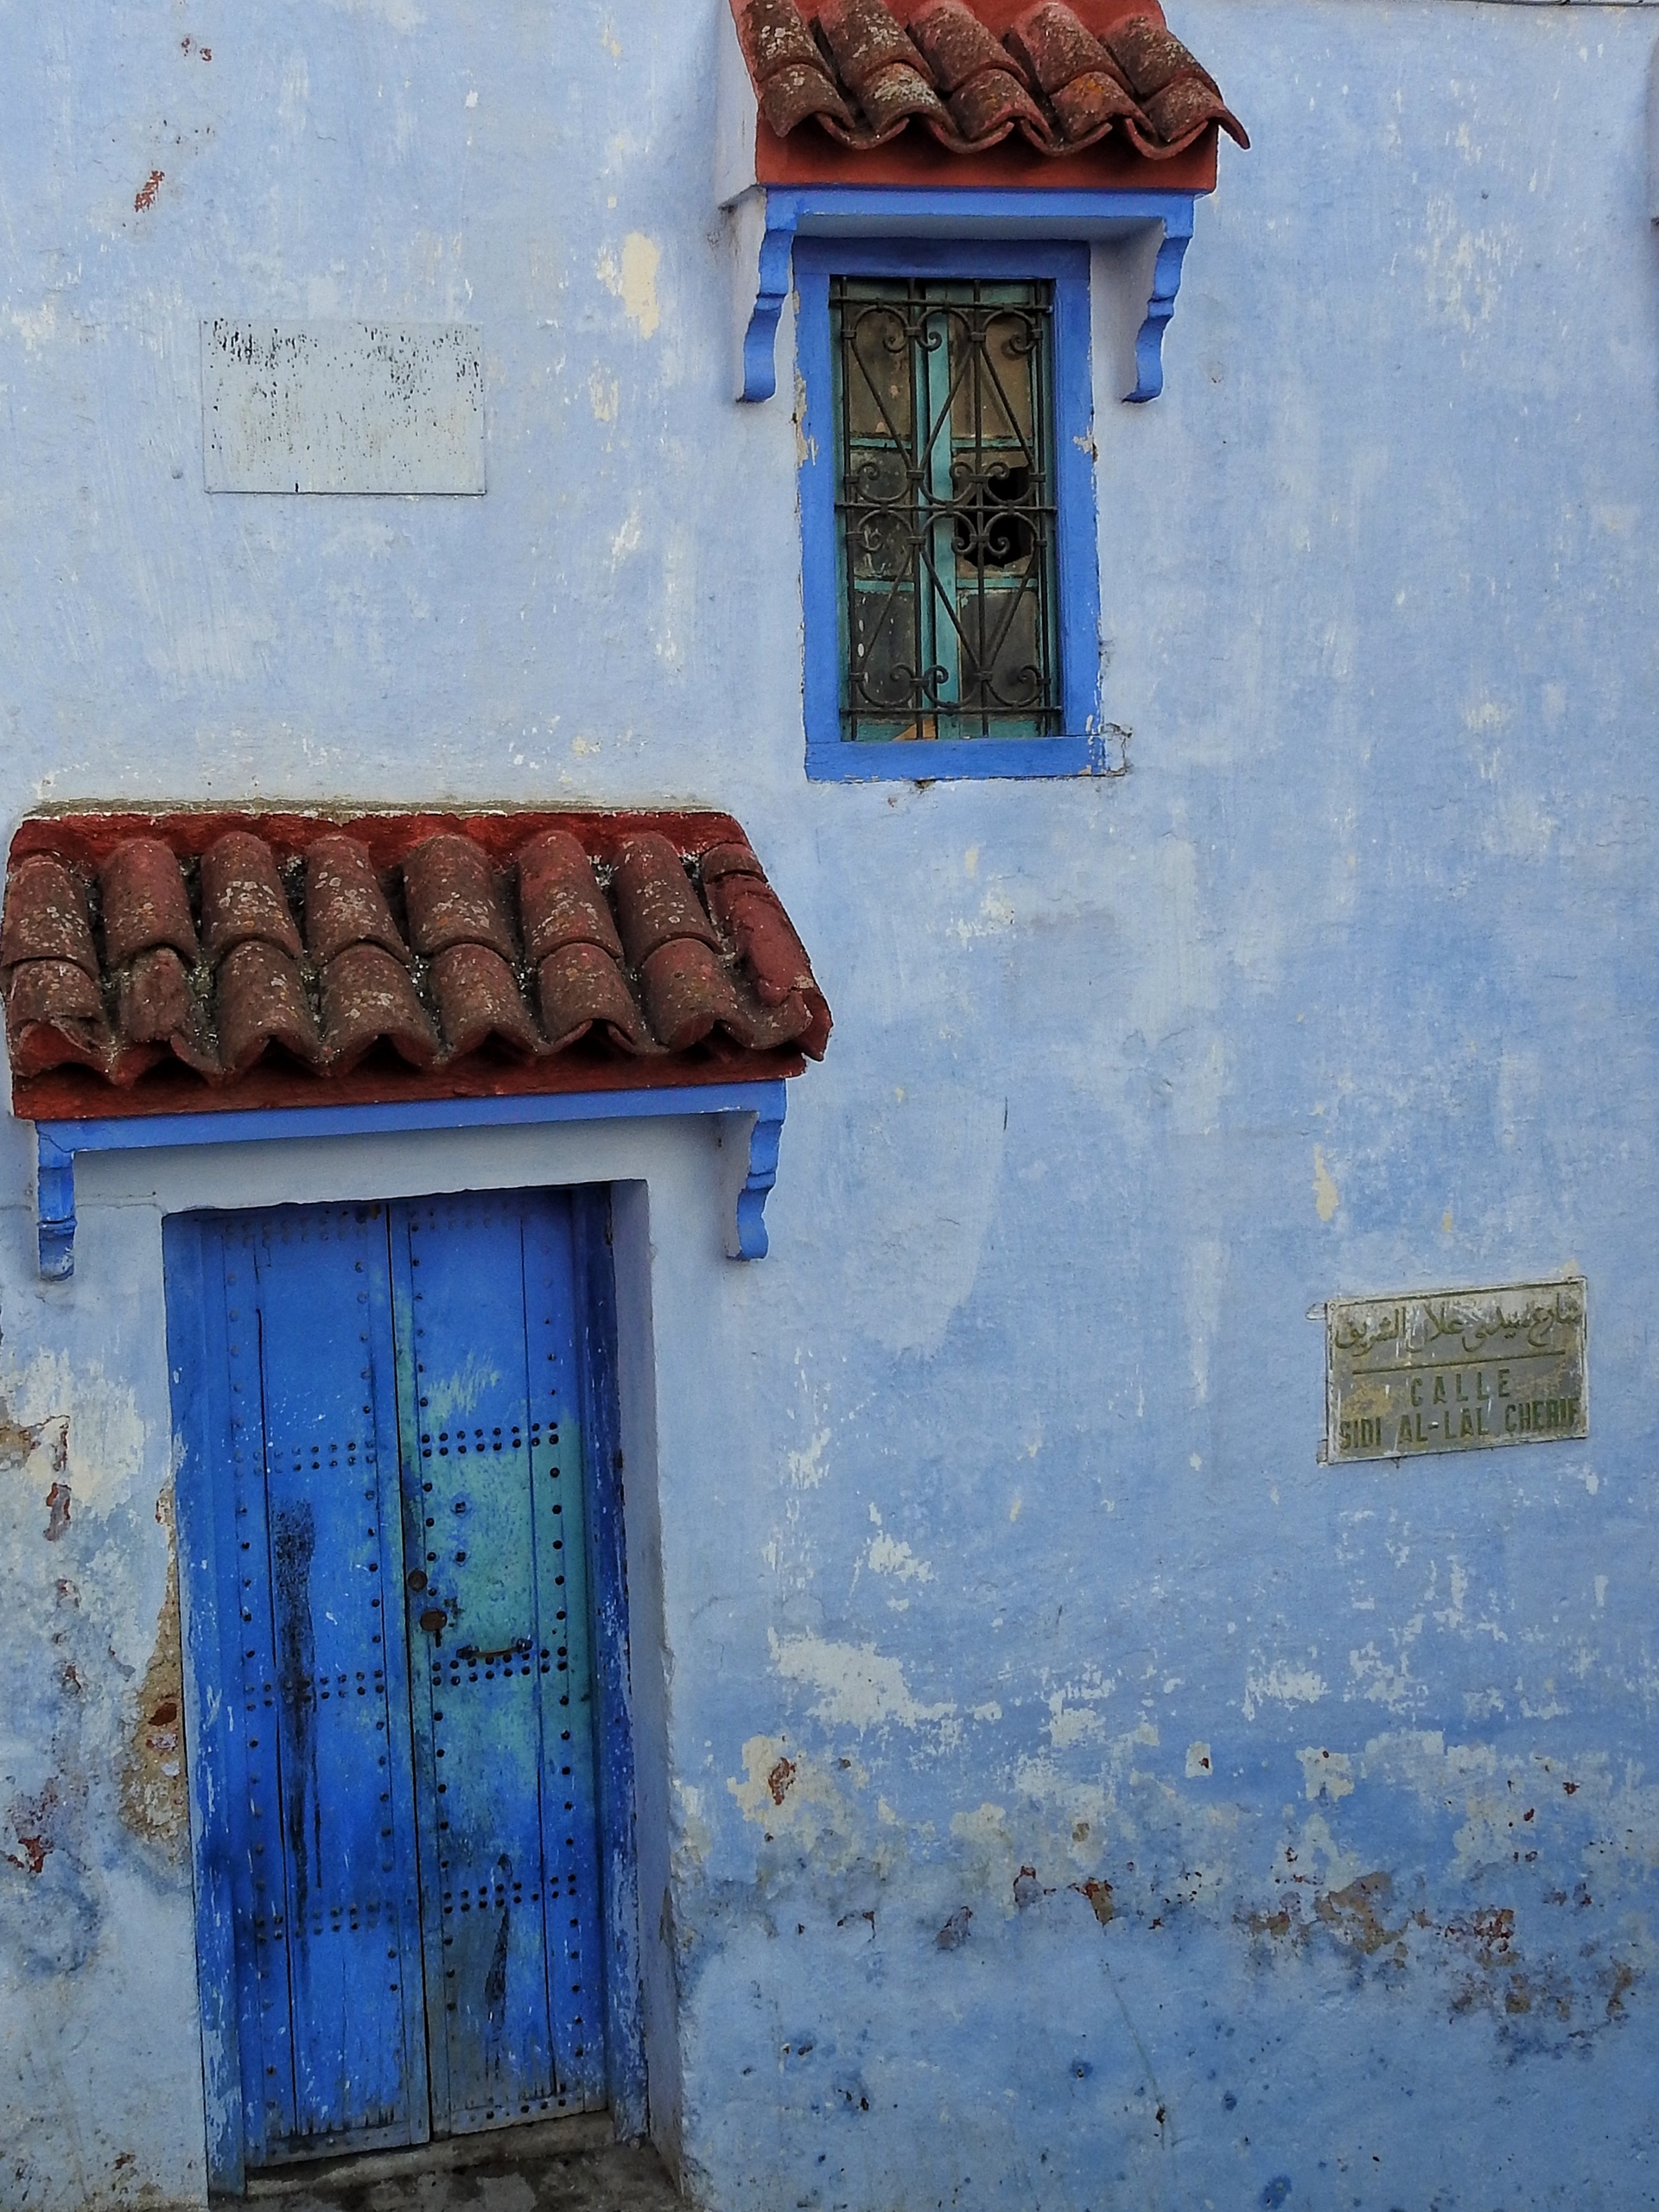 Blue is the color | shec, architecture, building, door